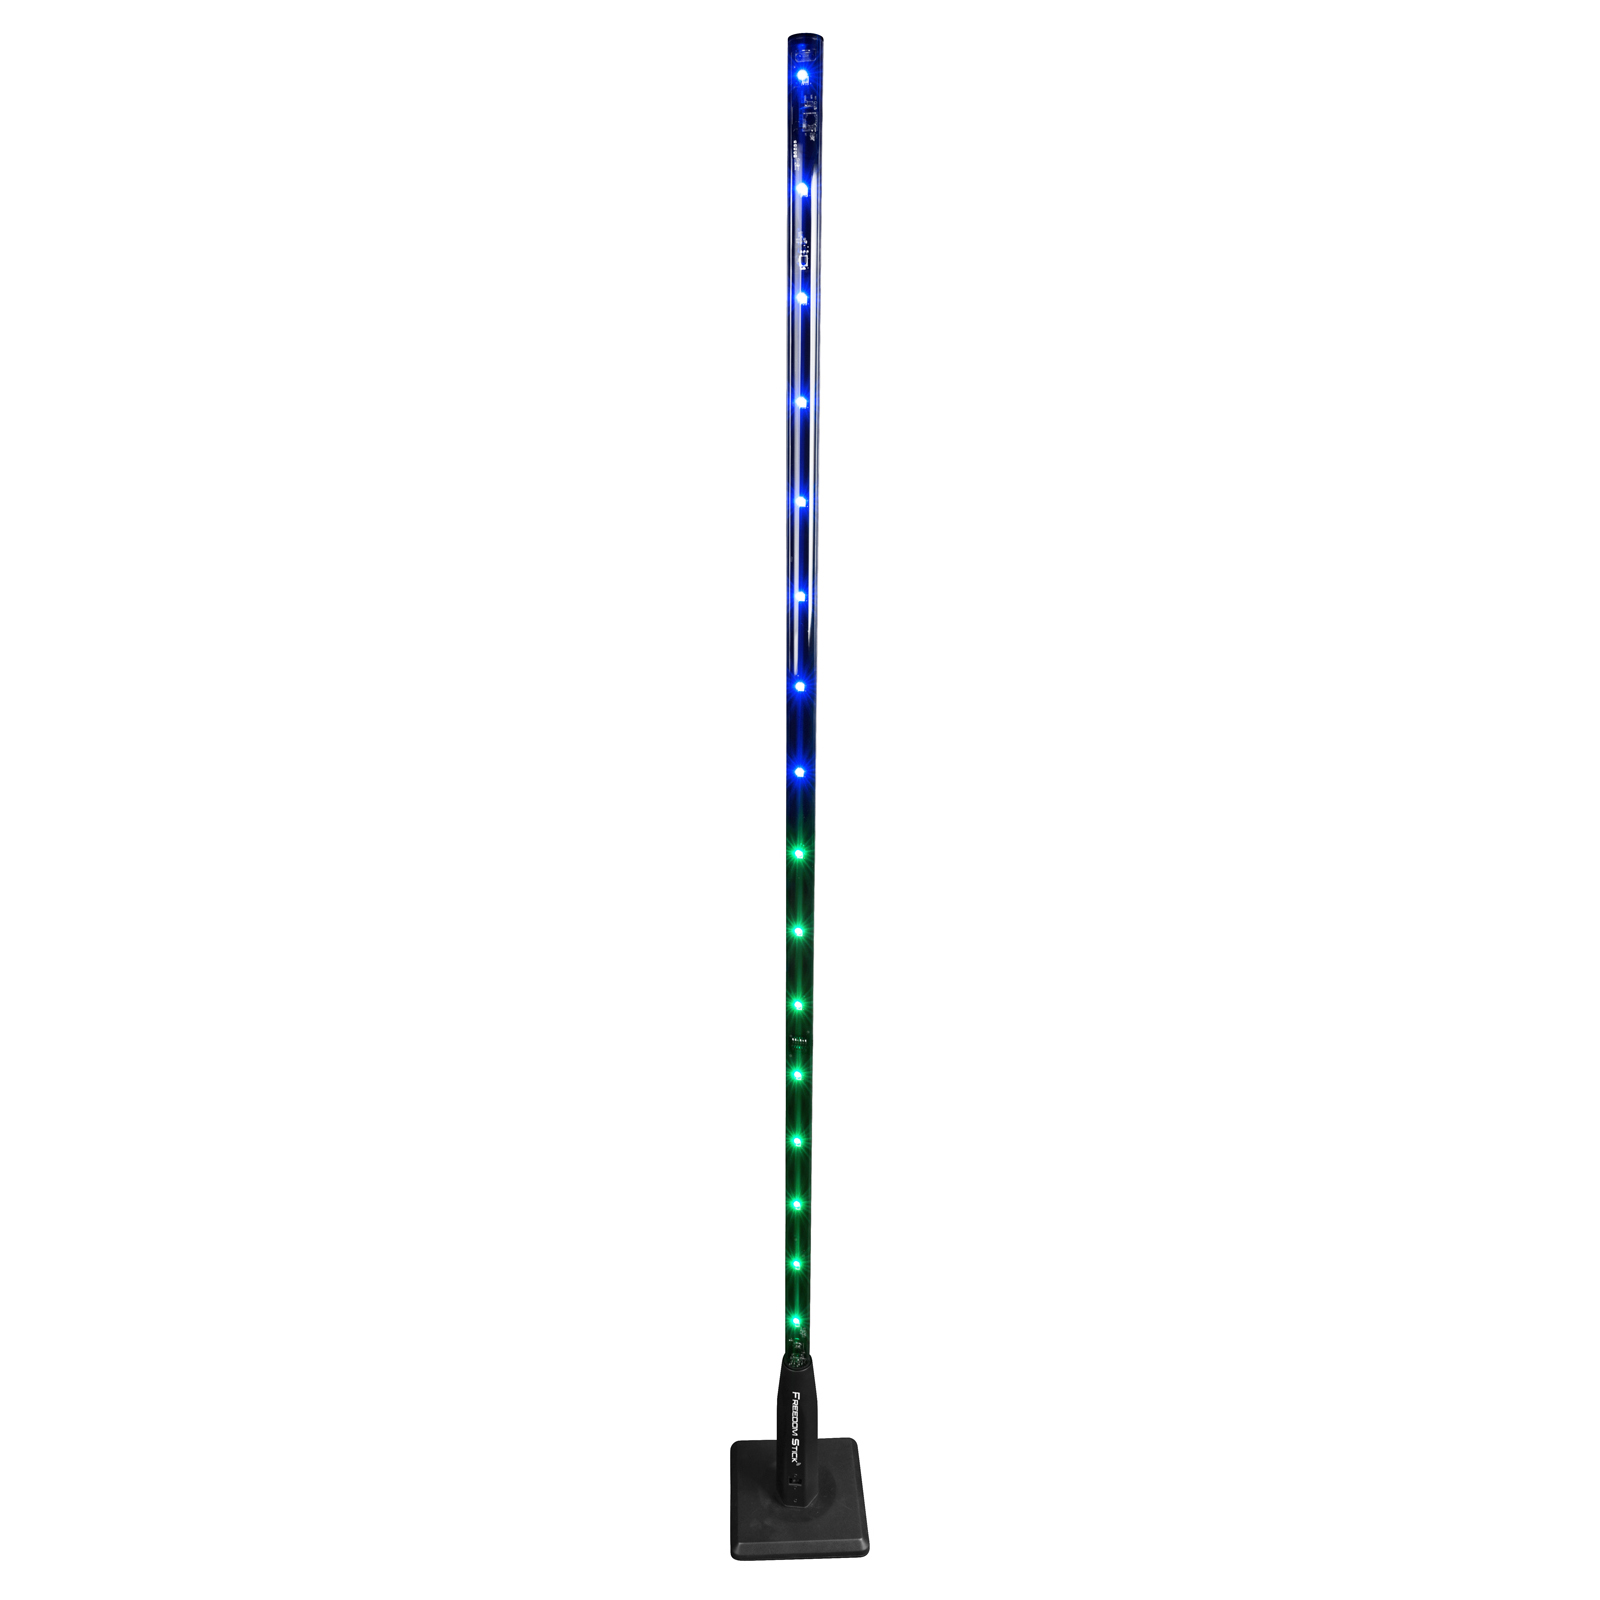 Chauvet Dj Freedom Stick B Attery Powered Rgb Led Pixel